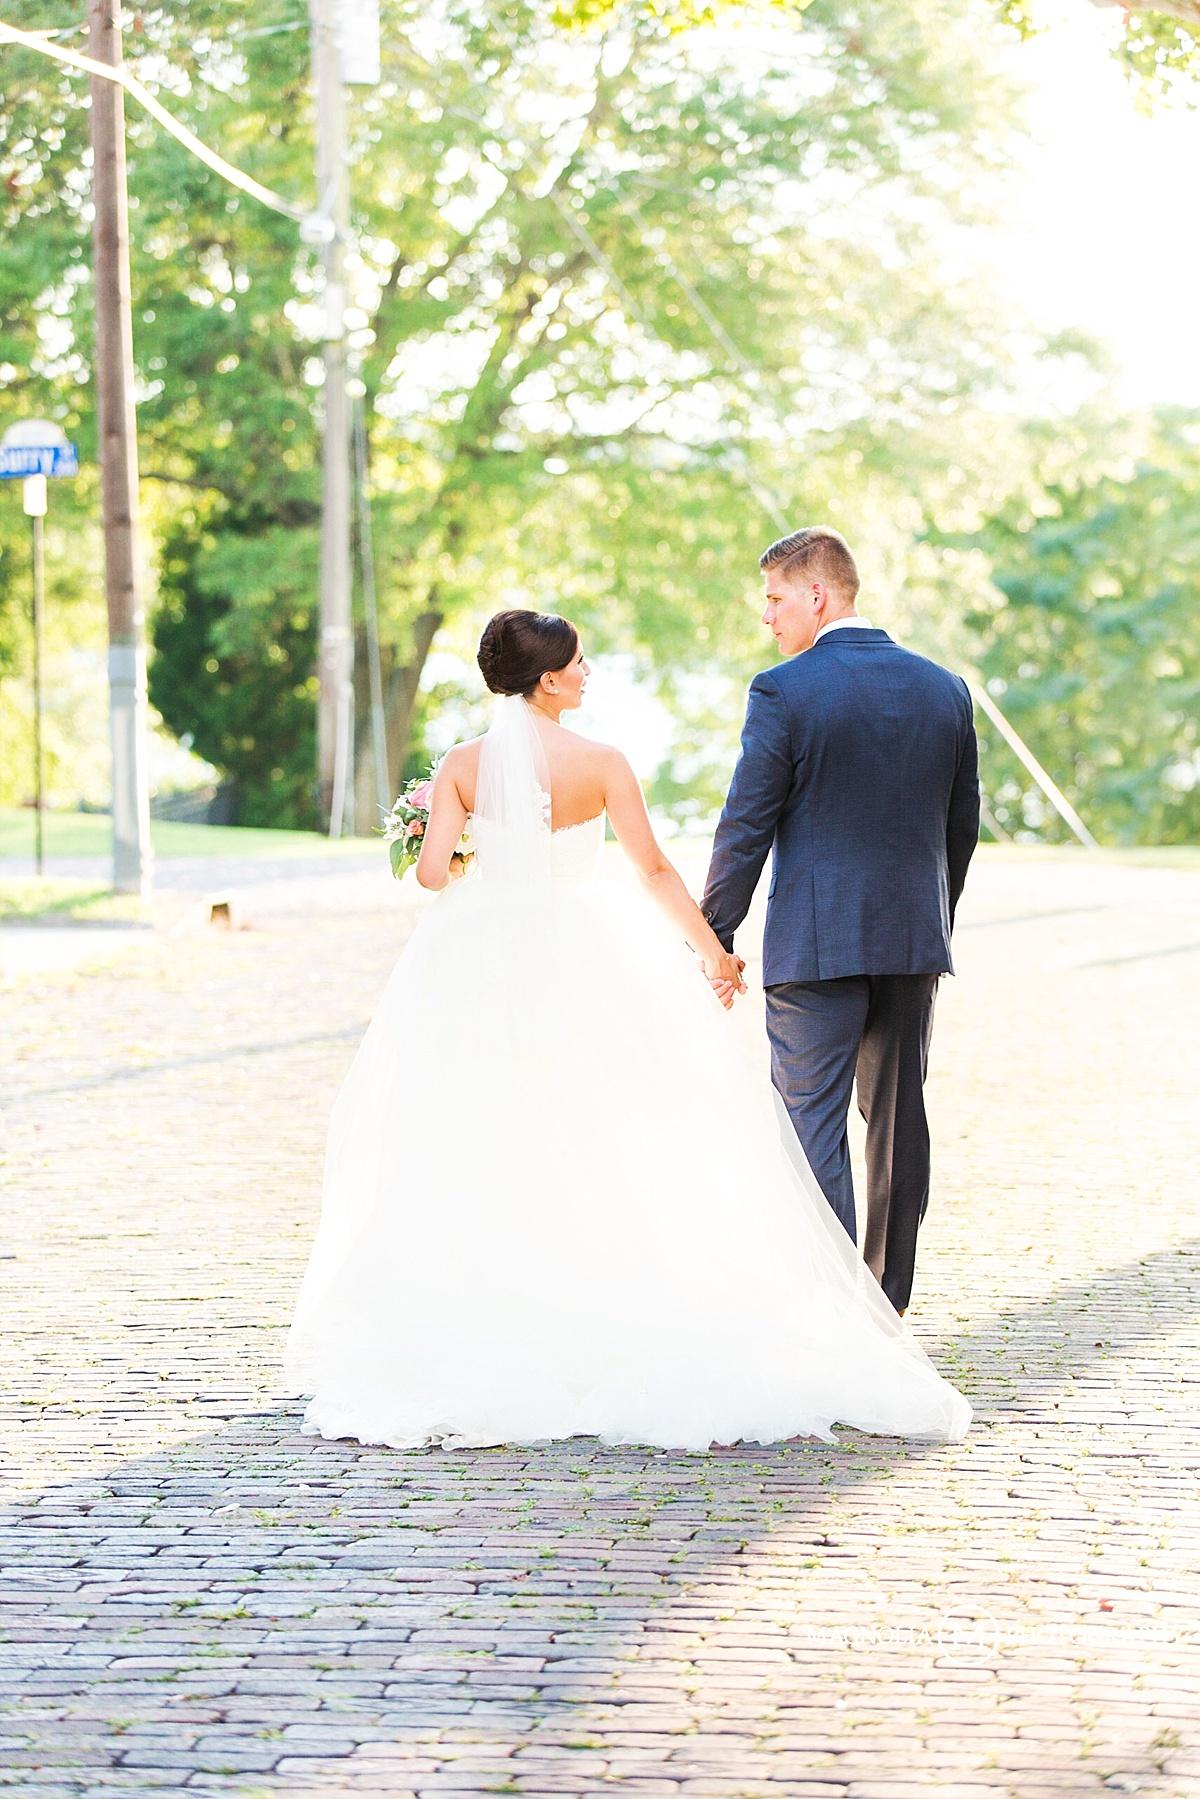 weddings at brooklyn arts center-57-1